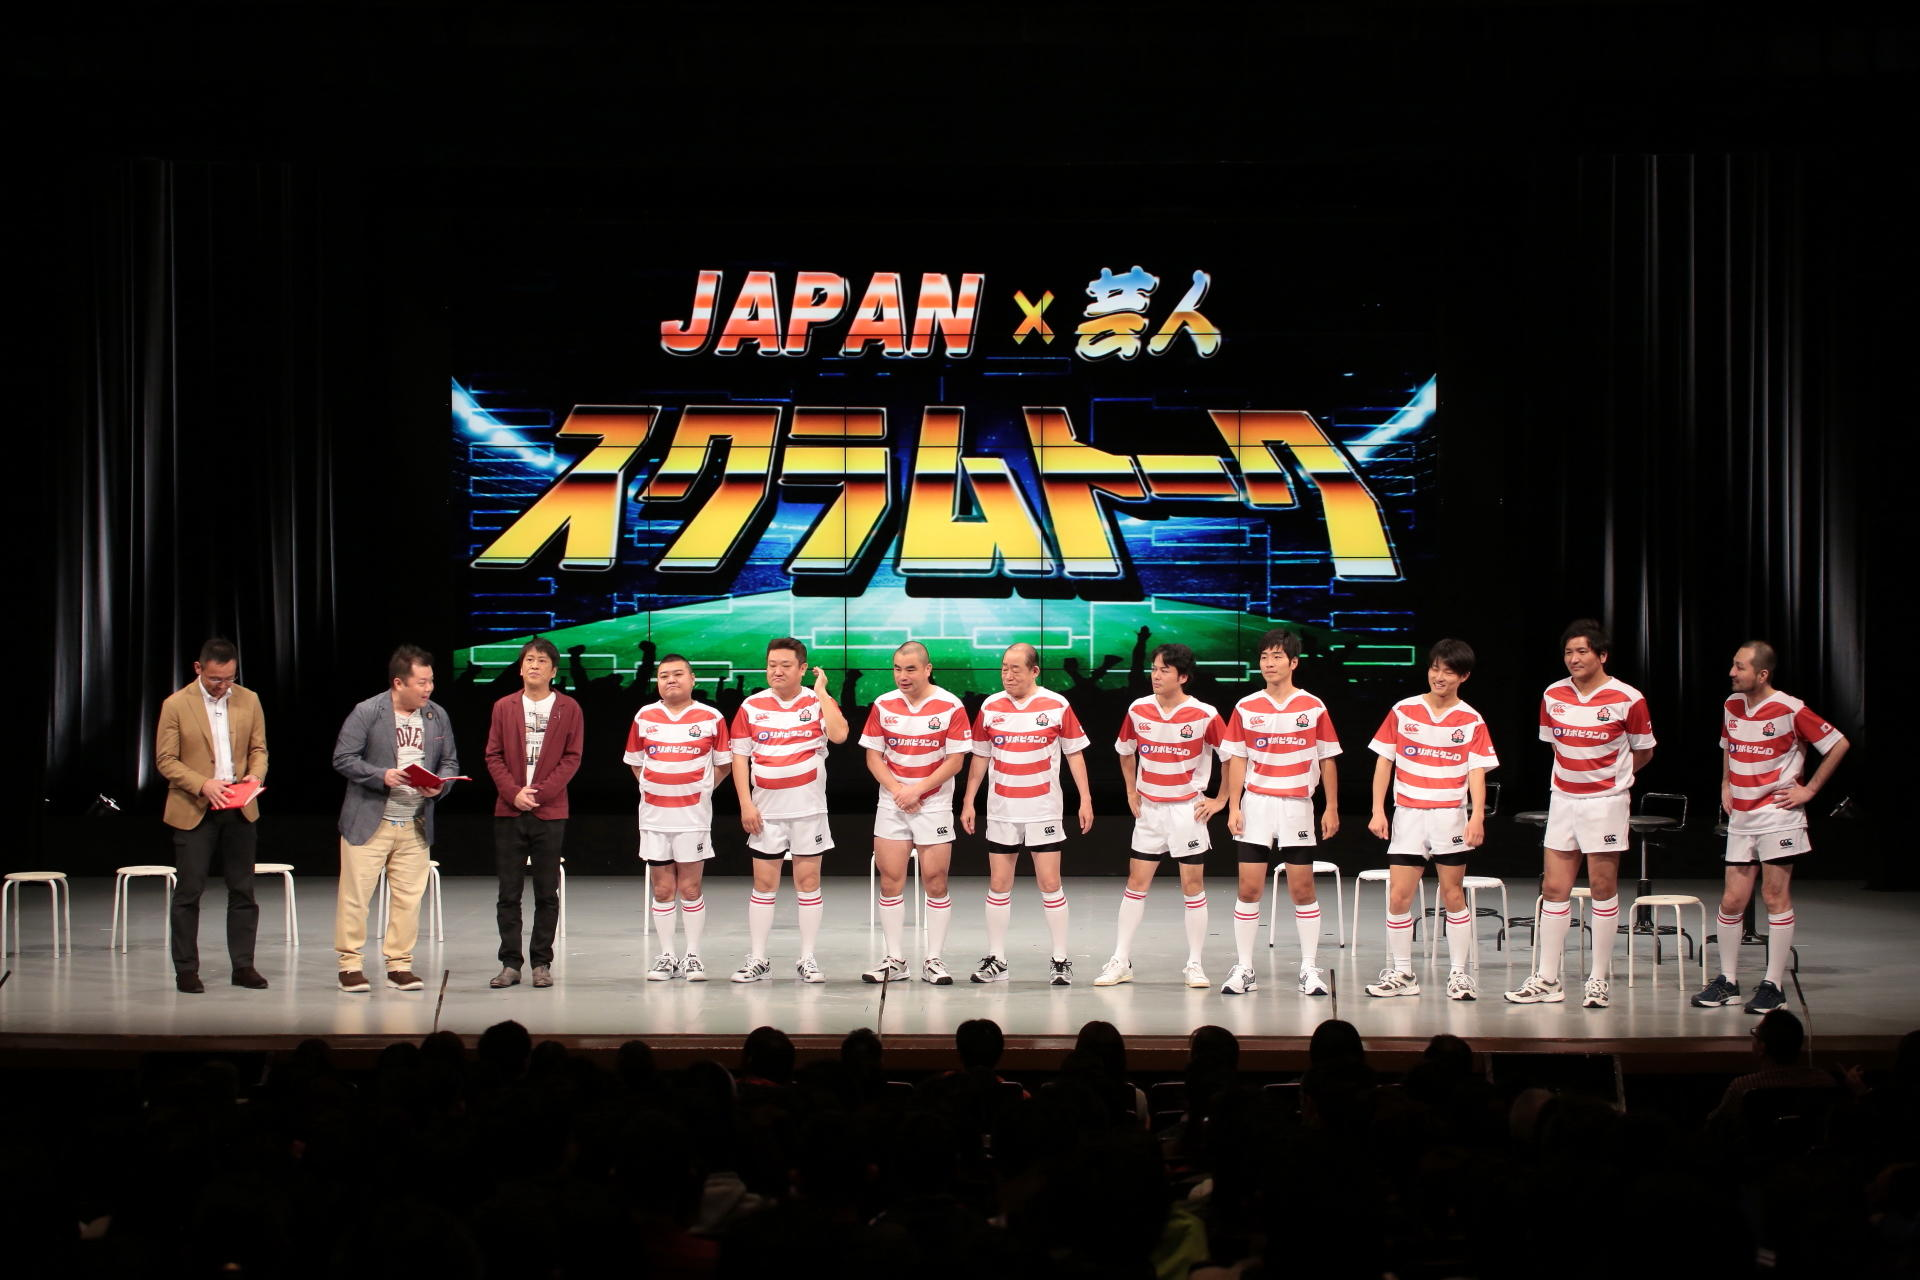 http://news.yoshimoto.co.jp/20160118174058-45abc7e73130a5e392bf05aff3f6f5135bf849ca.jpg